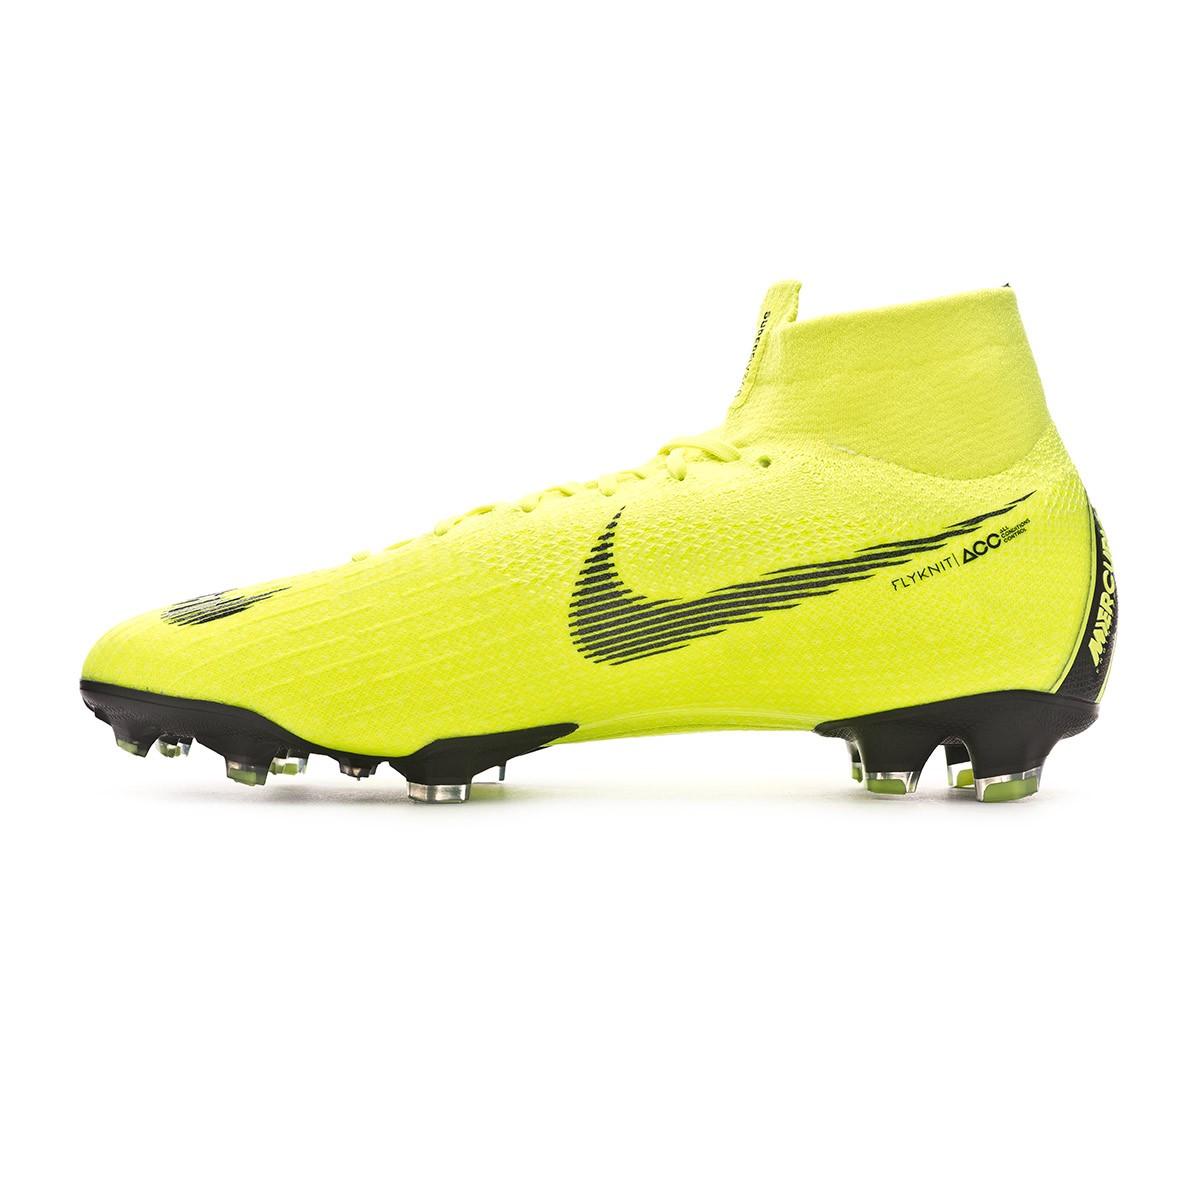 separation shoes 2ef9a 8a0b7 Chaussure de foot Nike Mercurial Superfly VI Elite FG Volt-Black - Tienda  de fútbol Fútbol Emotion